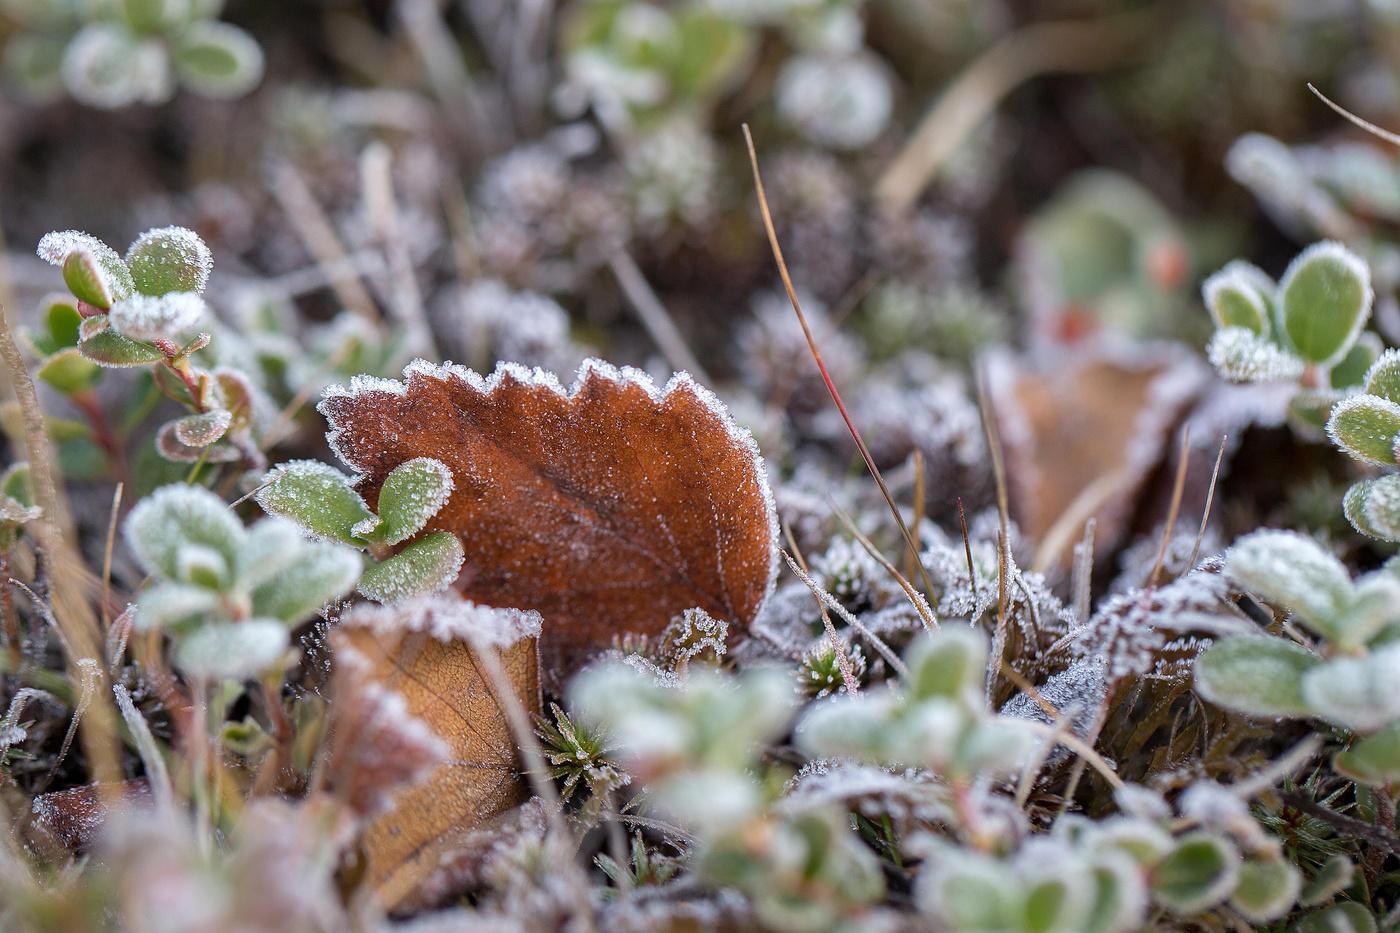 В ночь на среду в Брянске будет 4 градуса мороза